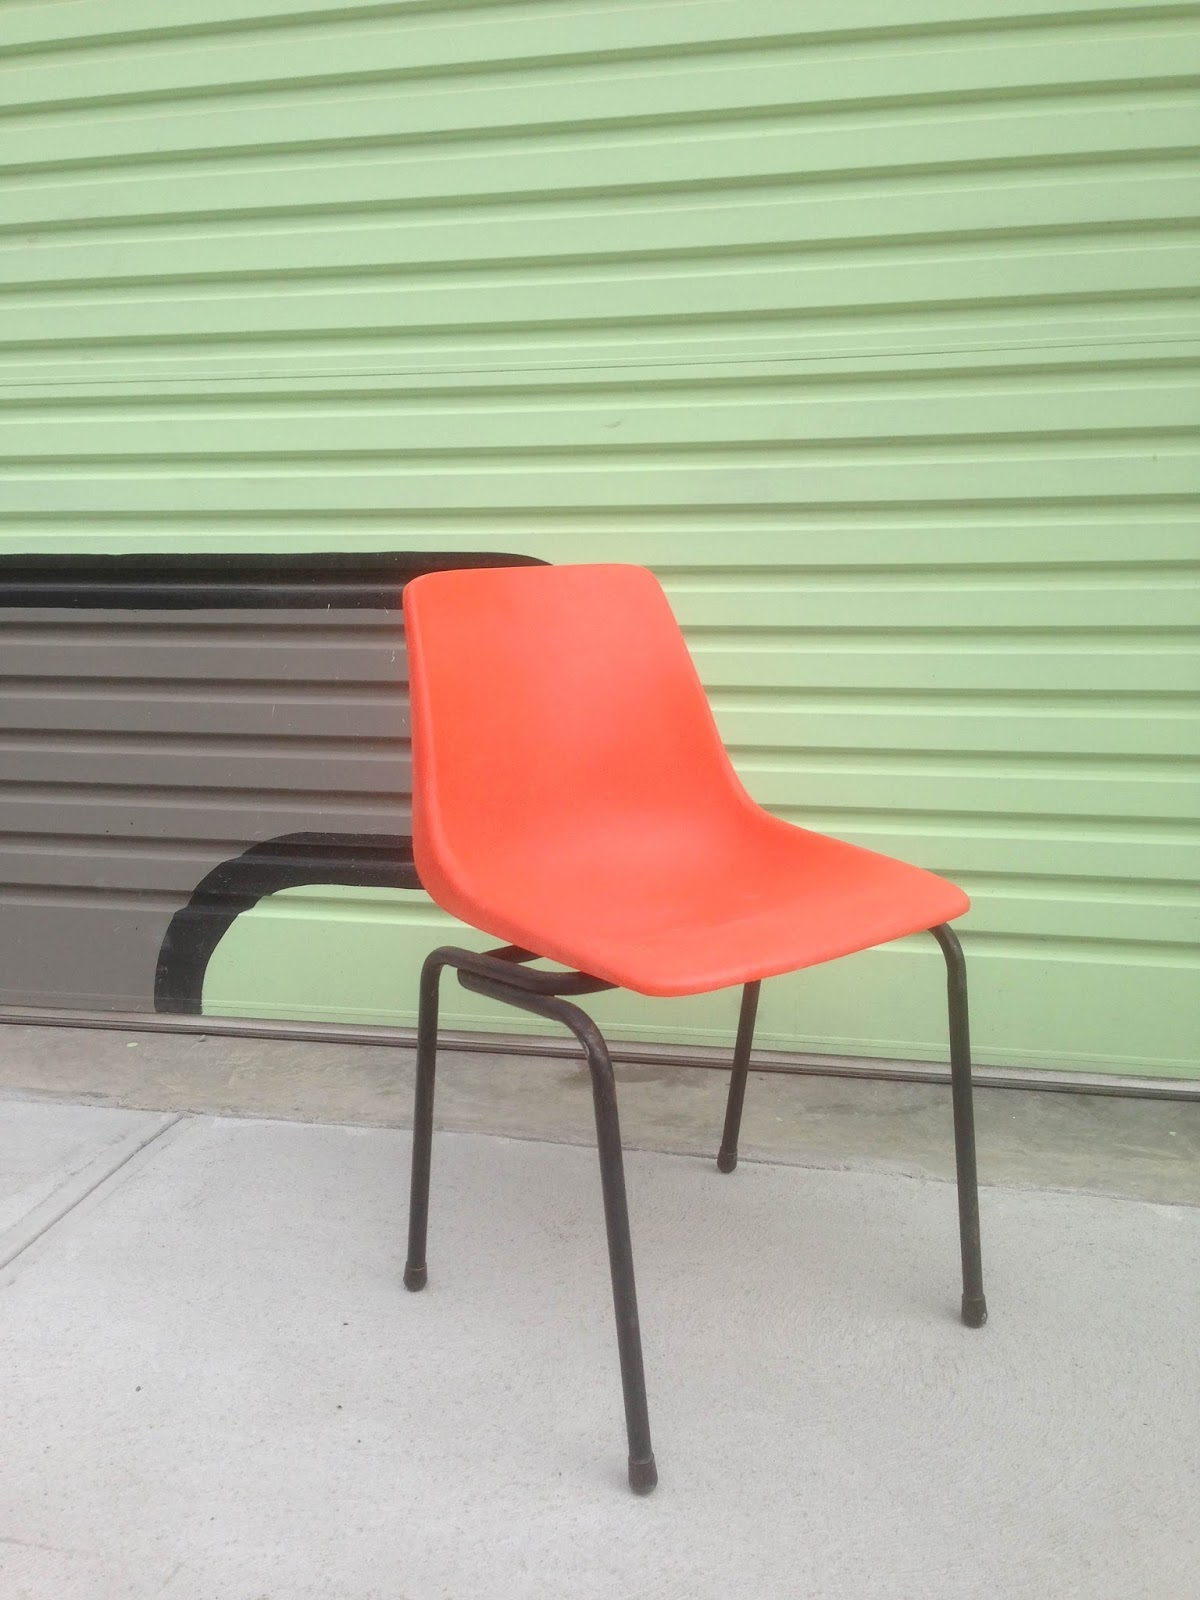 NAMCO School Chair Retro Cafechairs Chairsaales.com.au